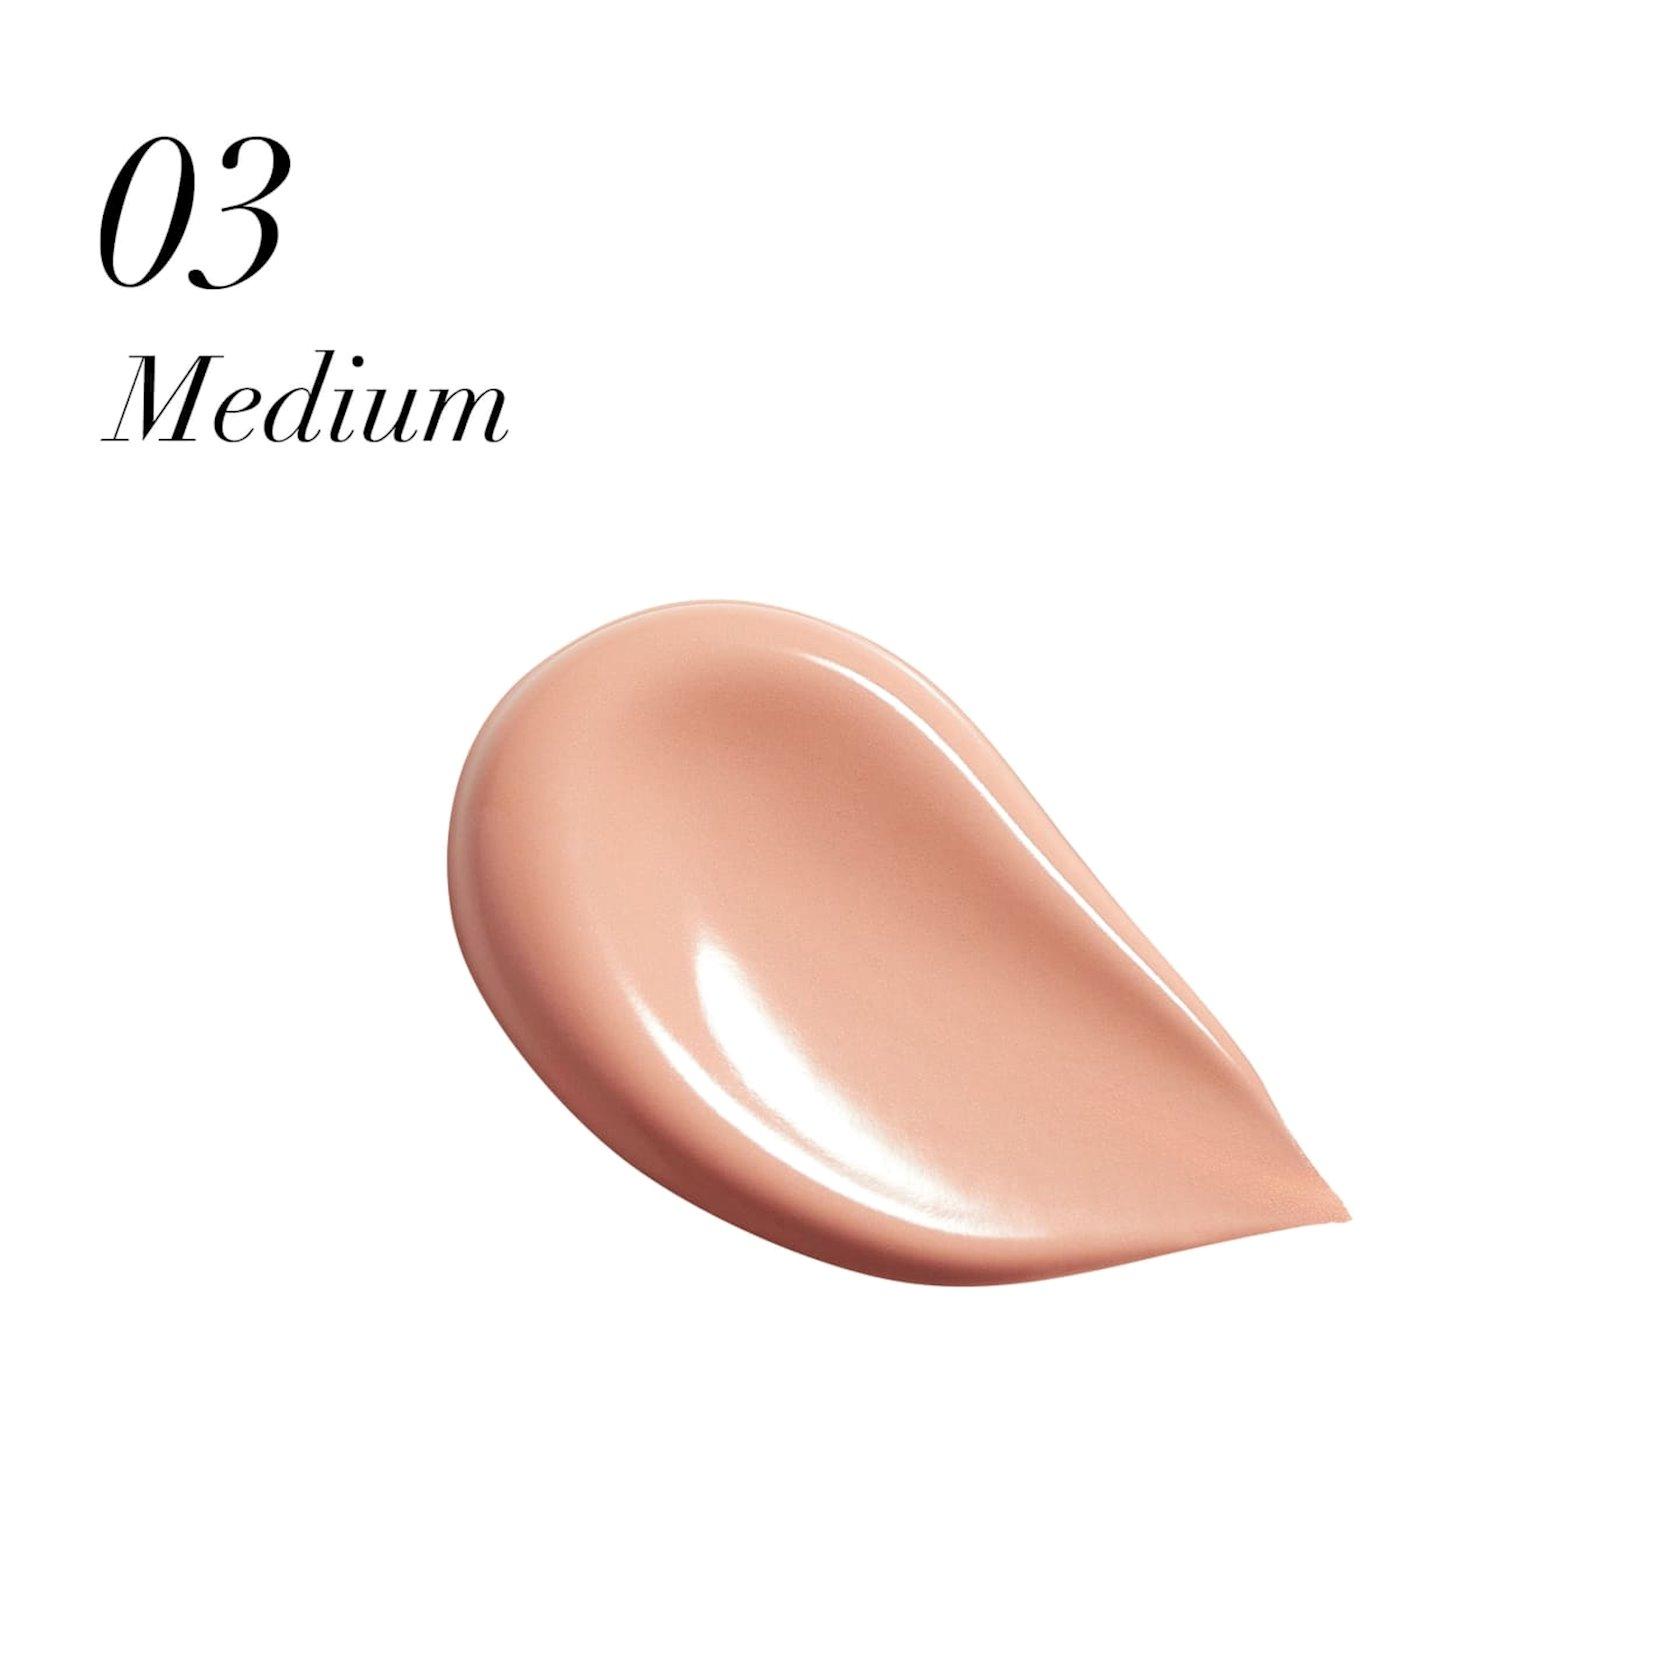 Göz ətrafı üçün konsiler Max Factor Radiant Lift Concealer №03 Medium 7 ml